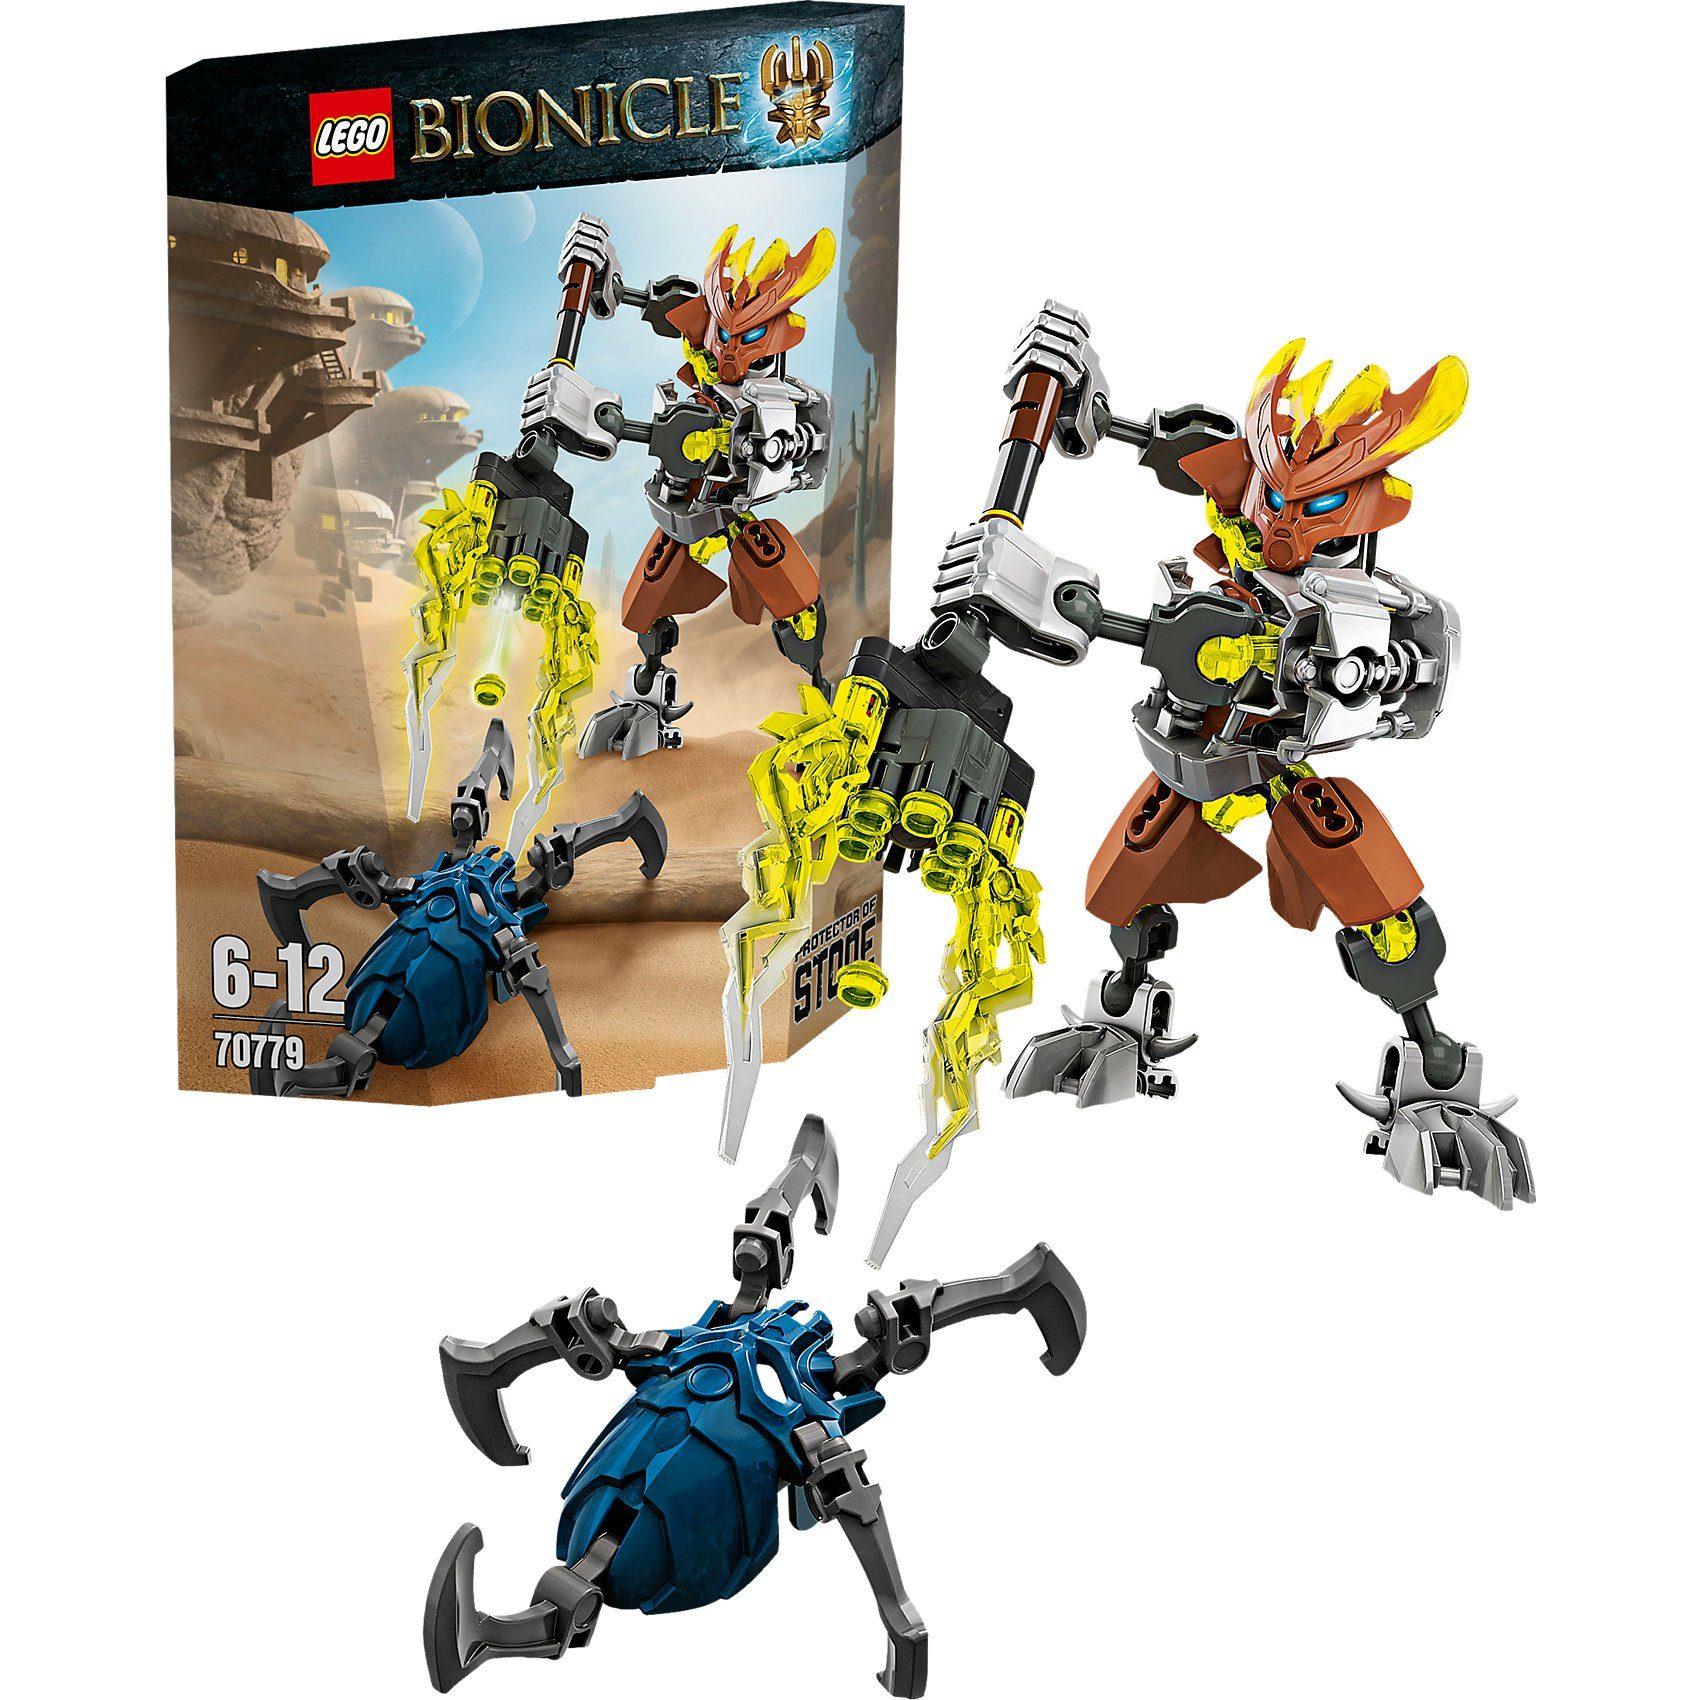 LEGO 70779 Bionicle: Hüter des Steins